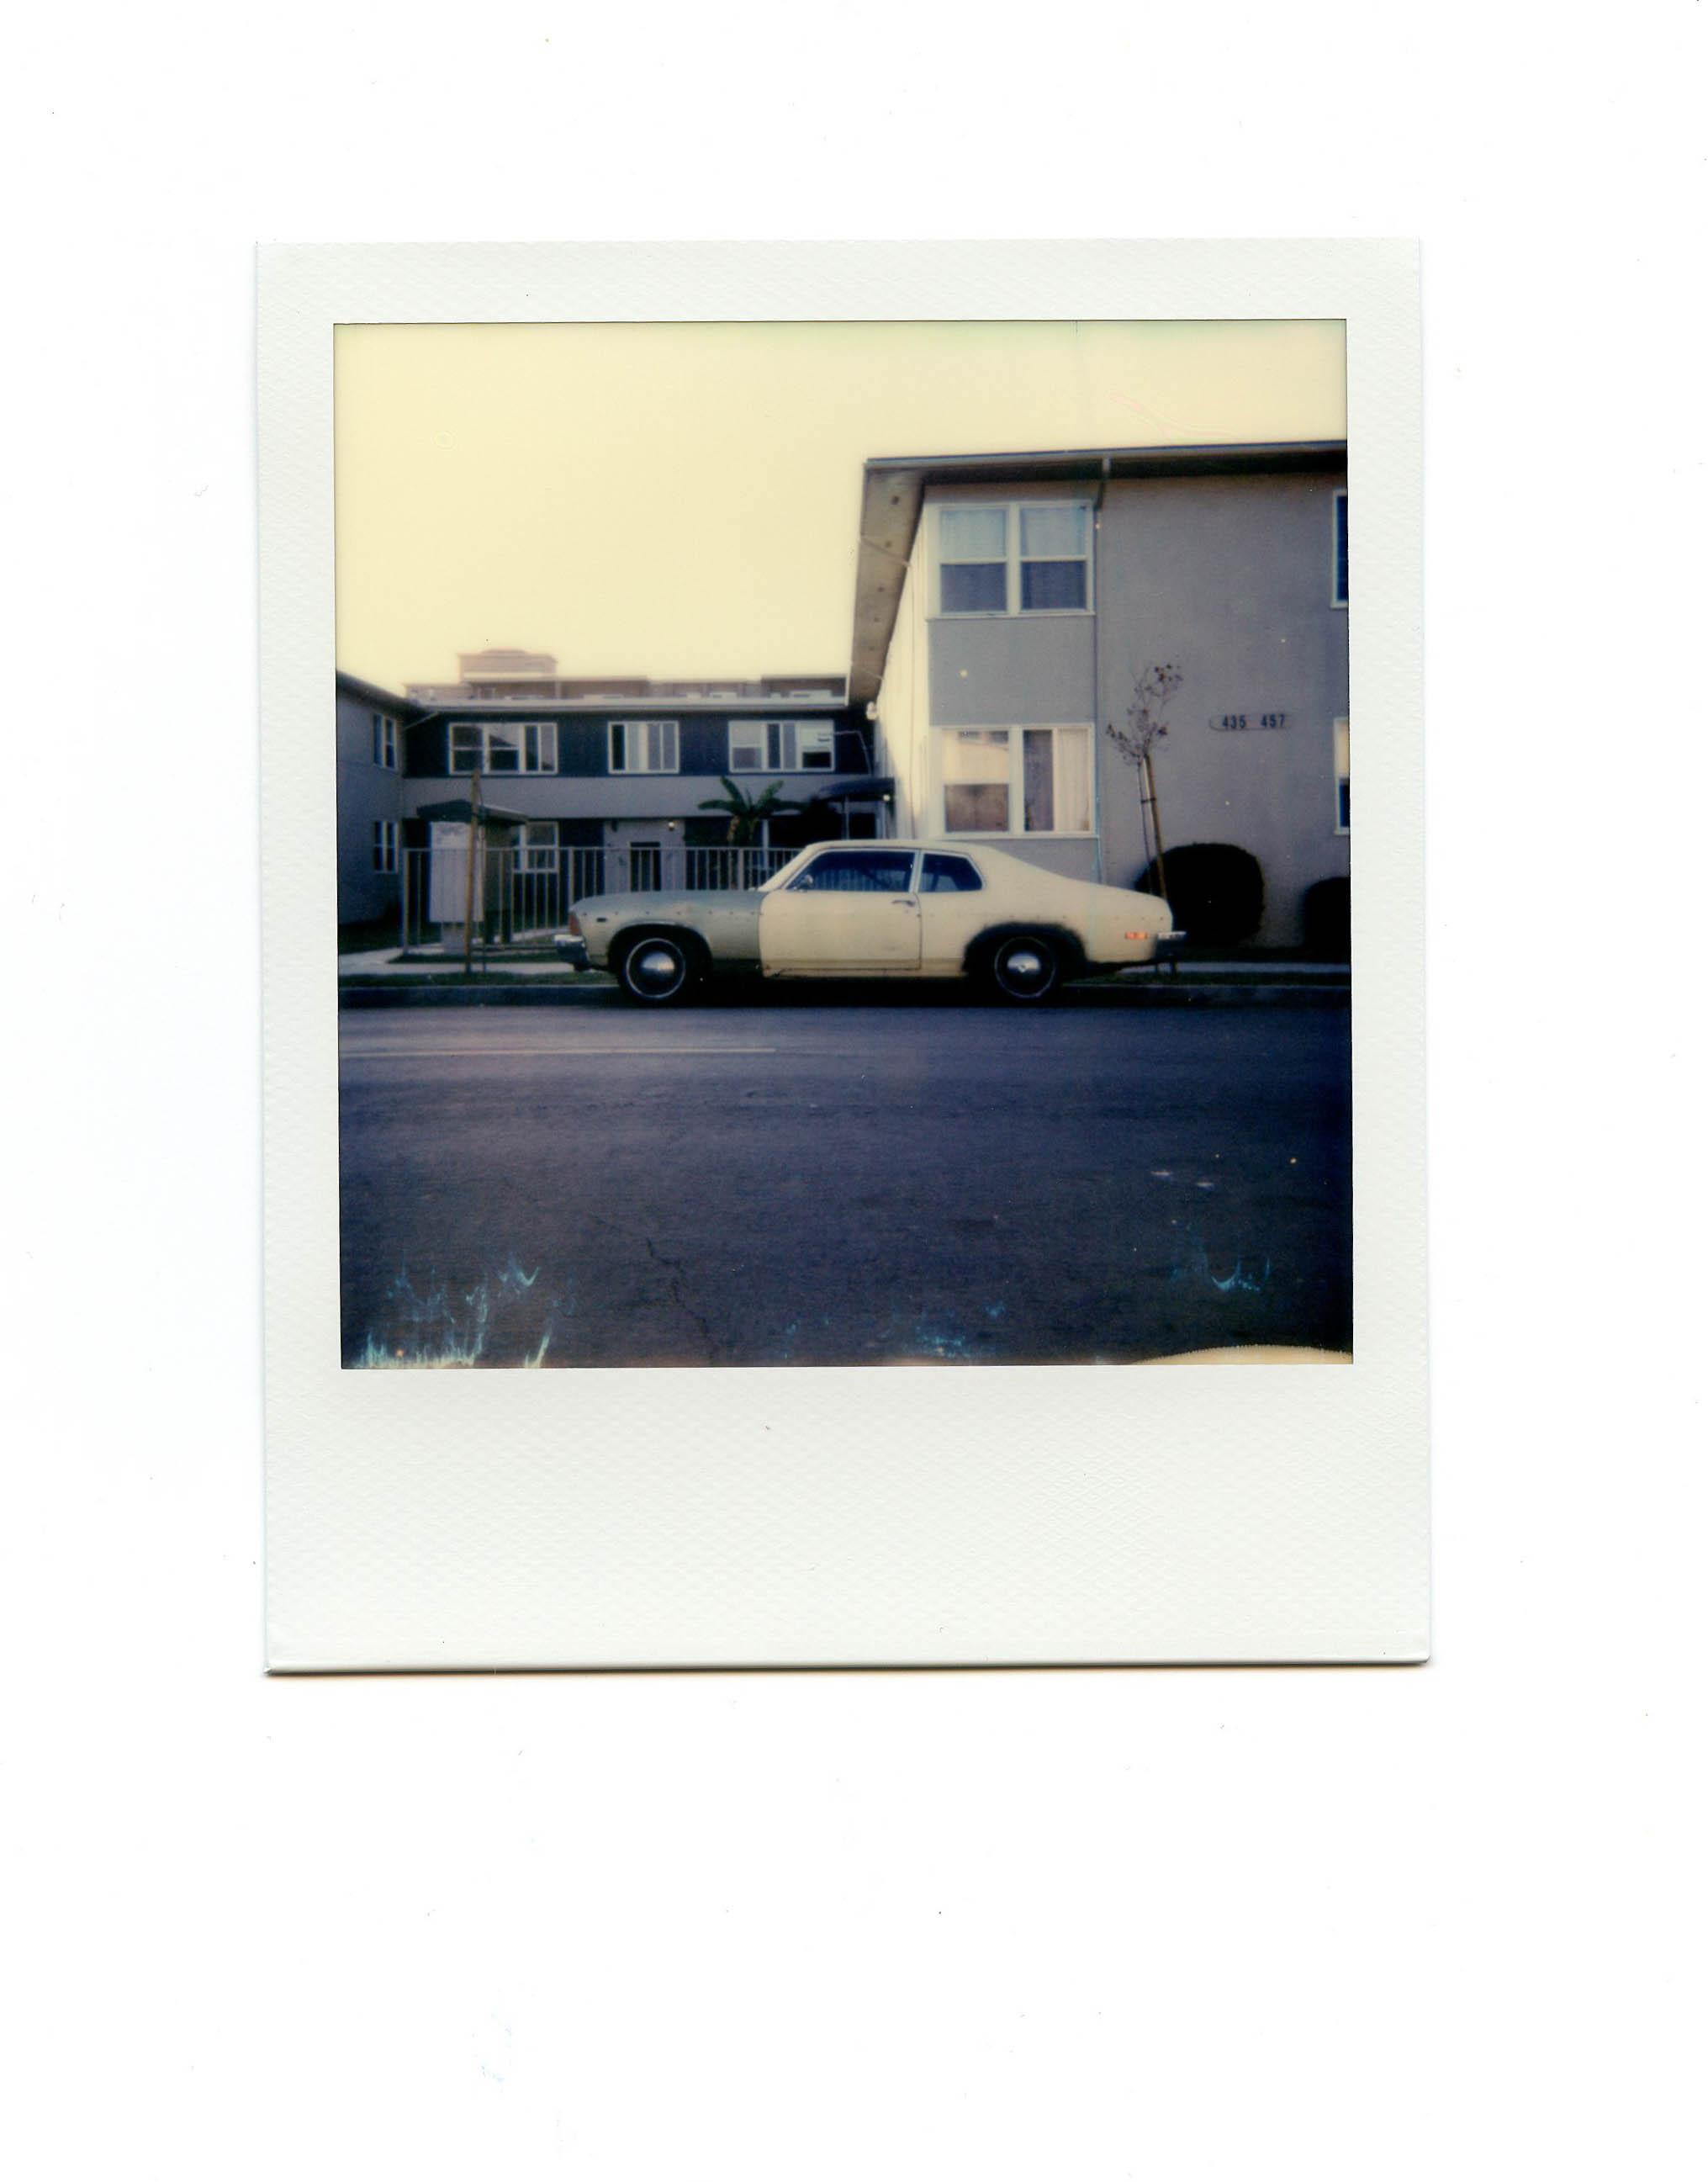 1 Polaroid Sun 600 Instant Film Camera Review - FilterGrade